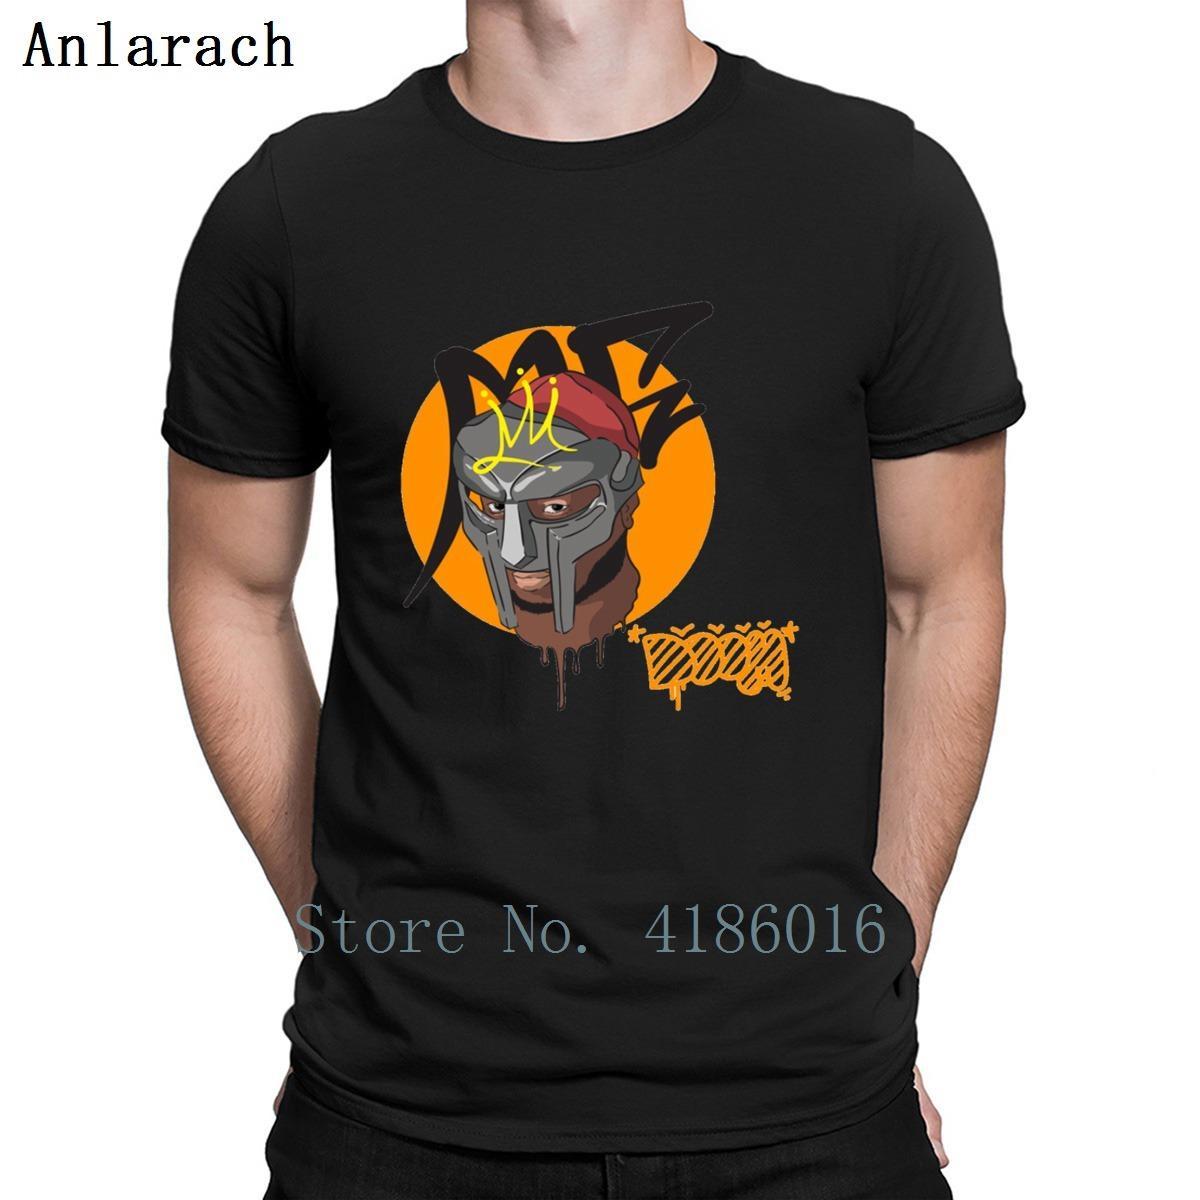 Mf Doom Rapper Concept Art-T-Shirt atmungsaktiv Frühling Letters Over Größe 5xl Fit Short Sleeve Designs Homme Hemd